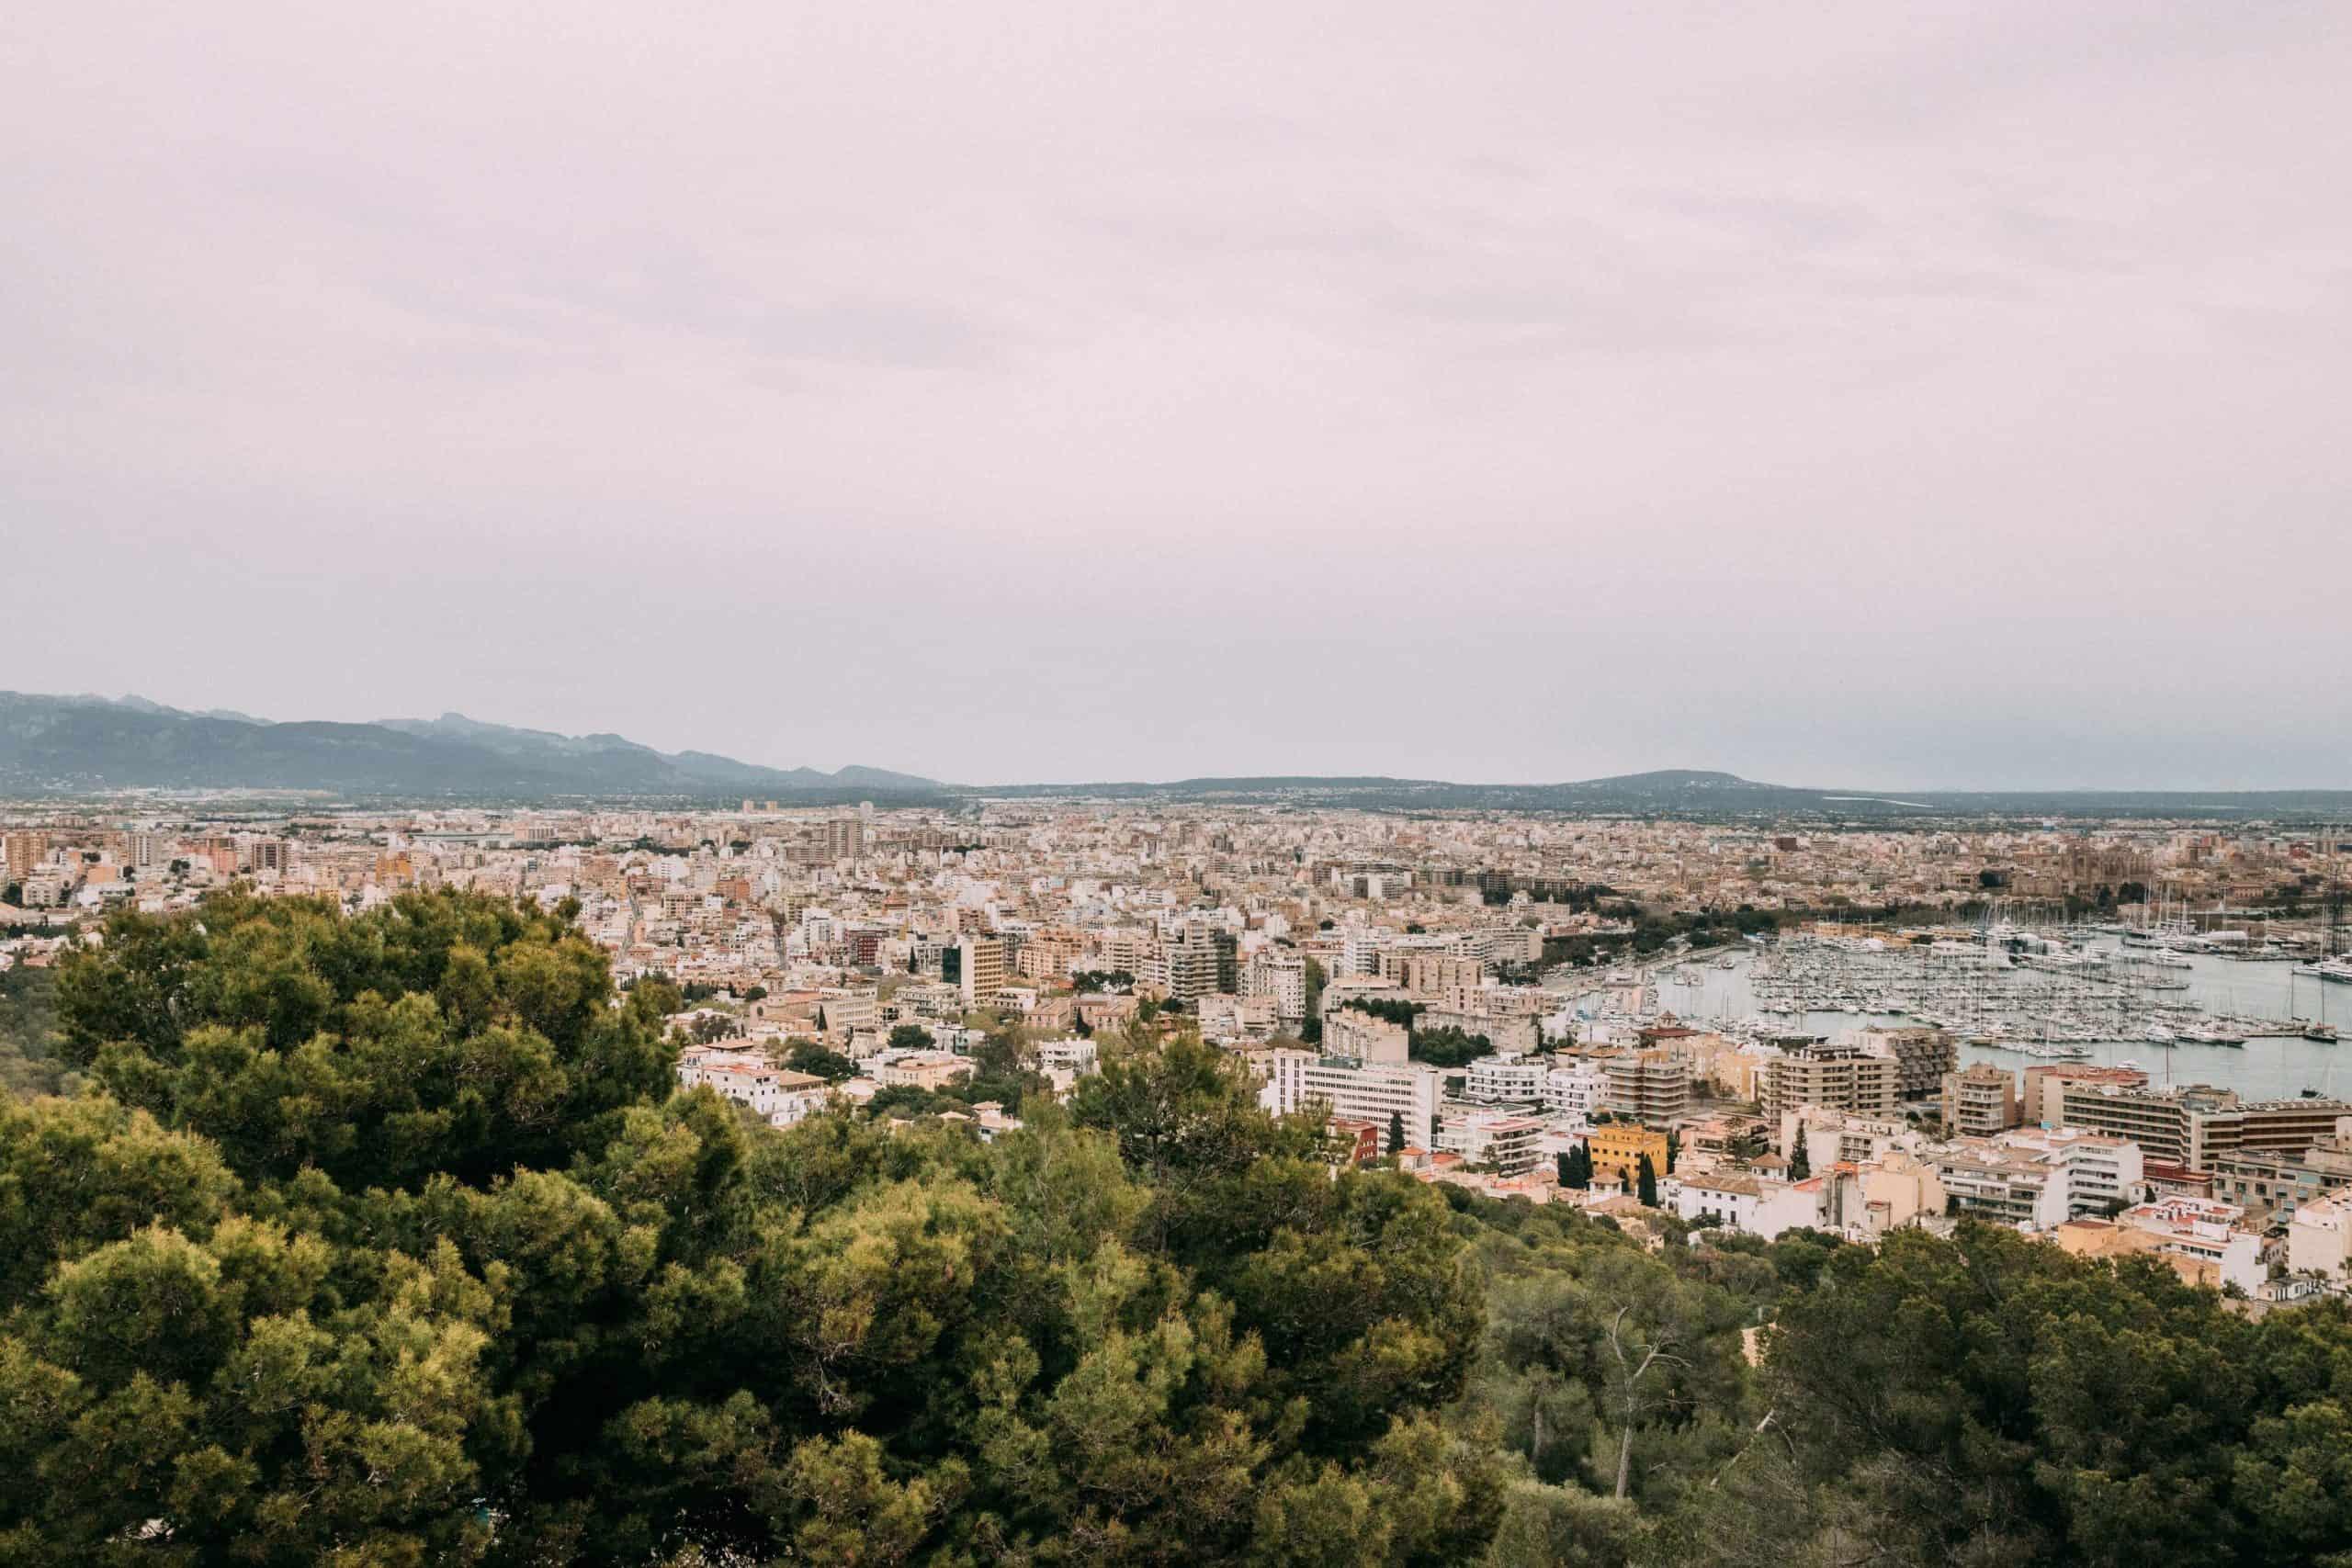 View from the Sobremunt climb in Mallorca